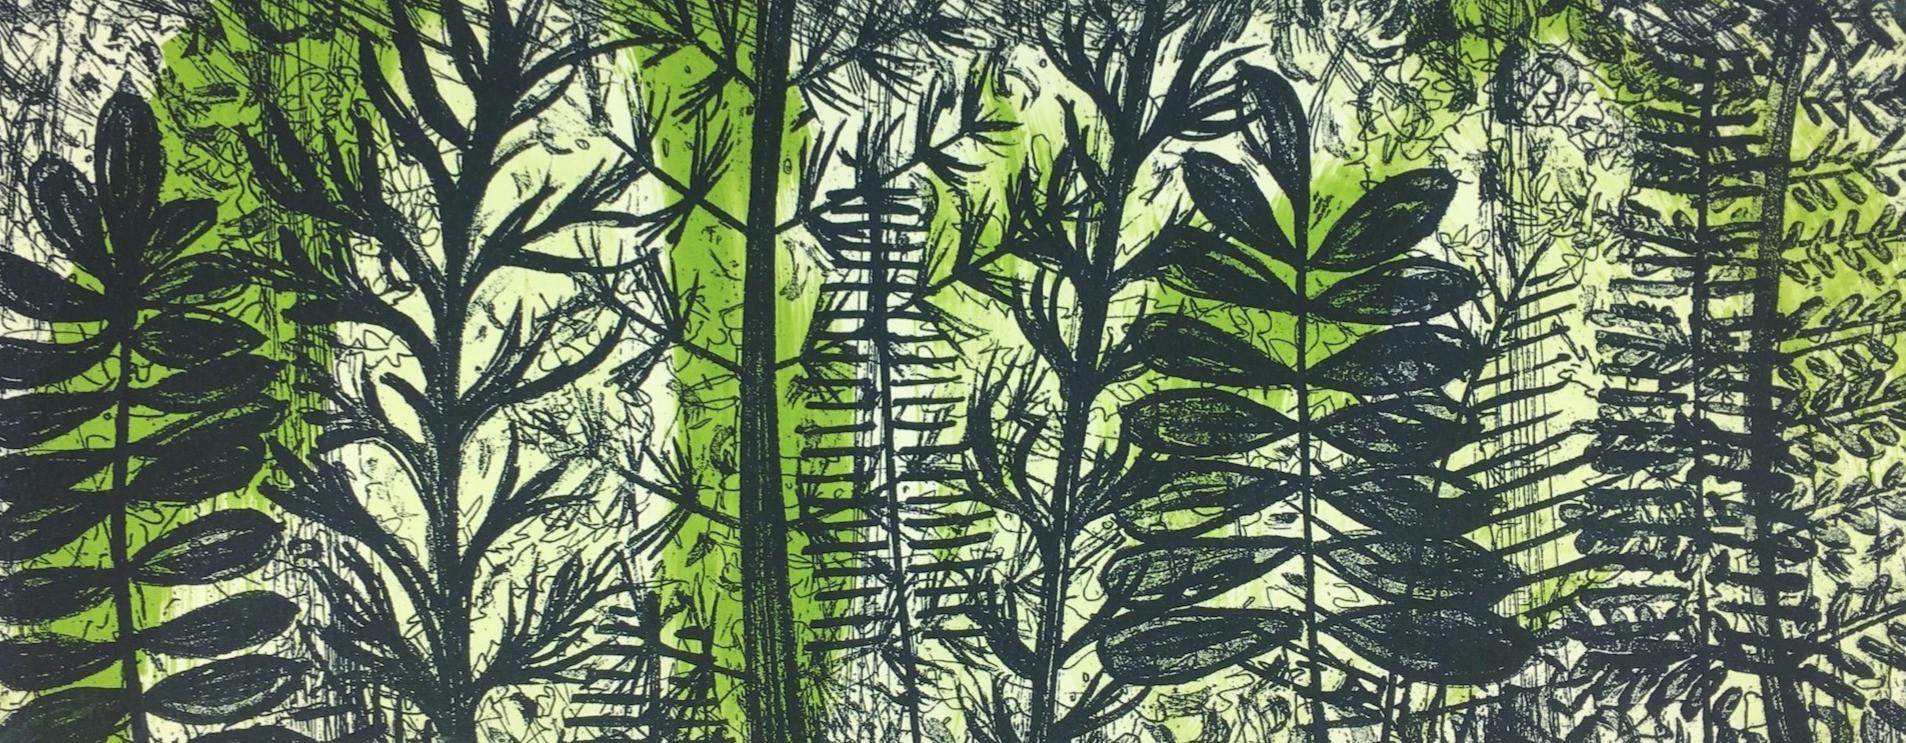 Ancient Ferns